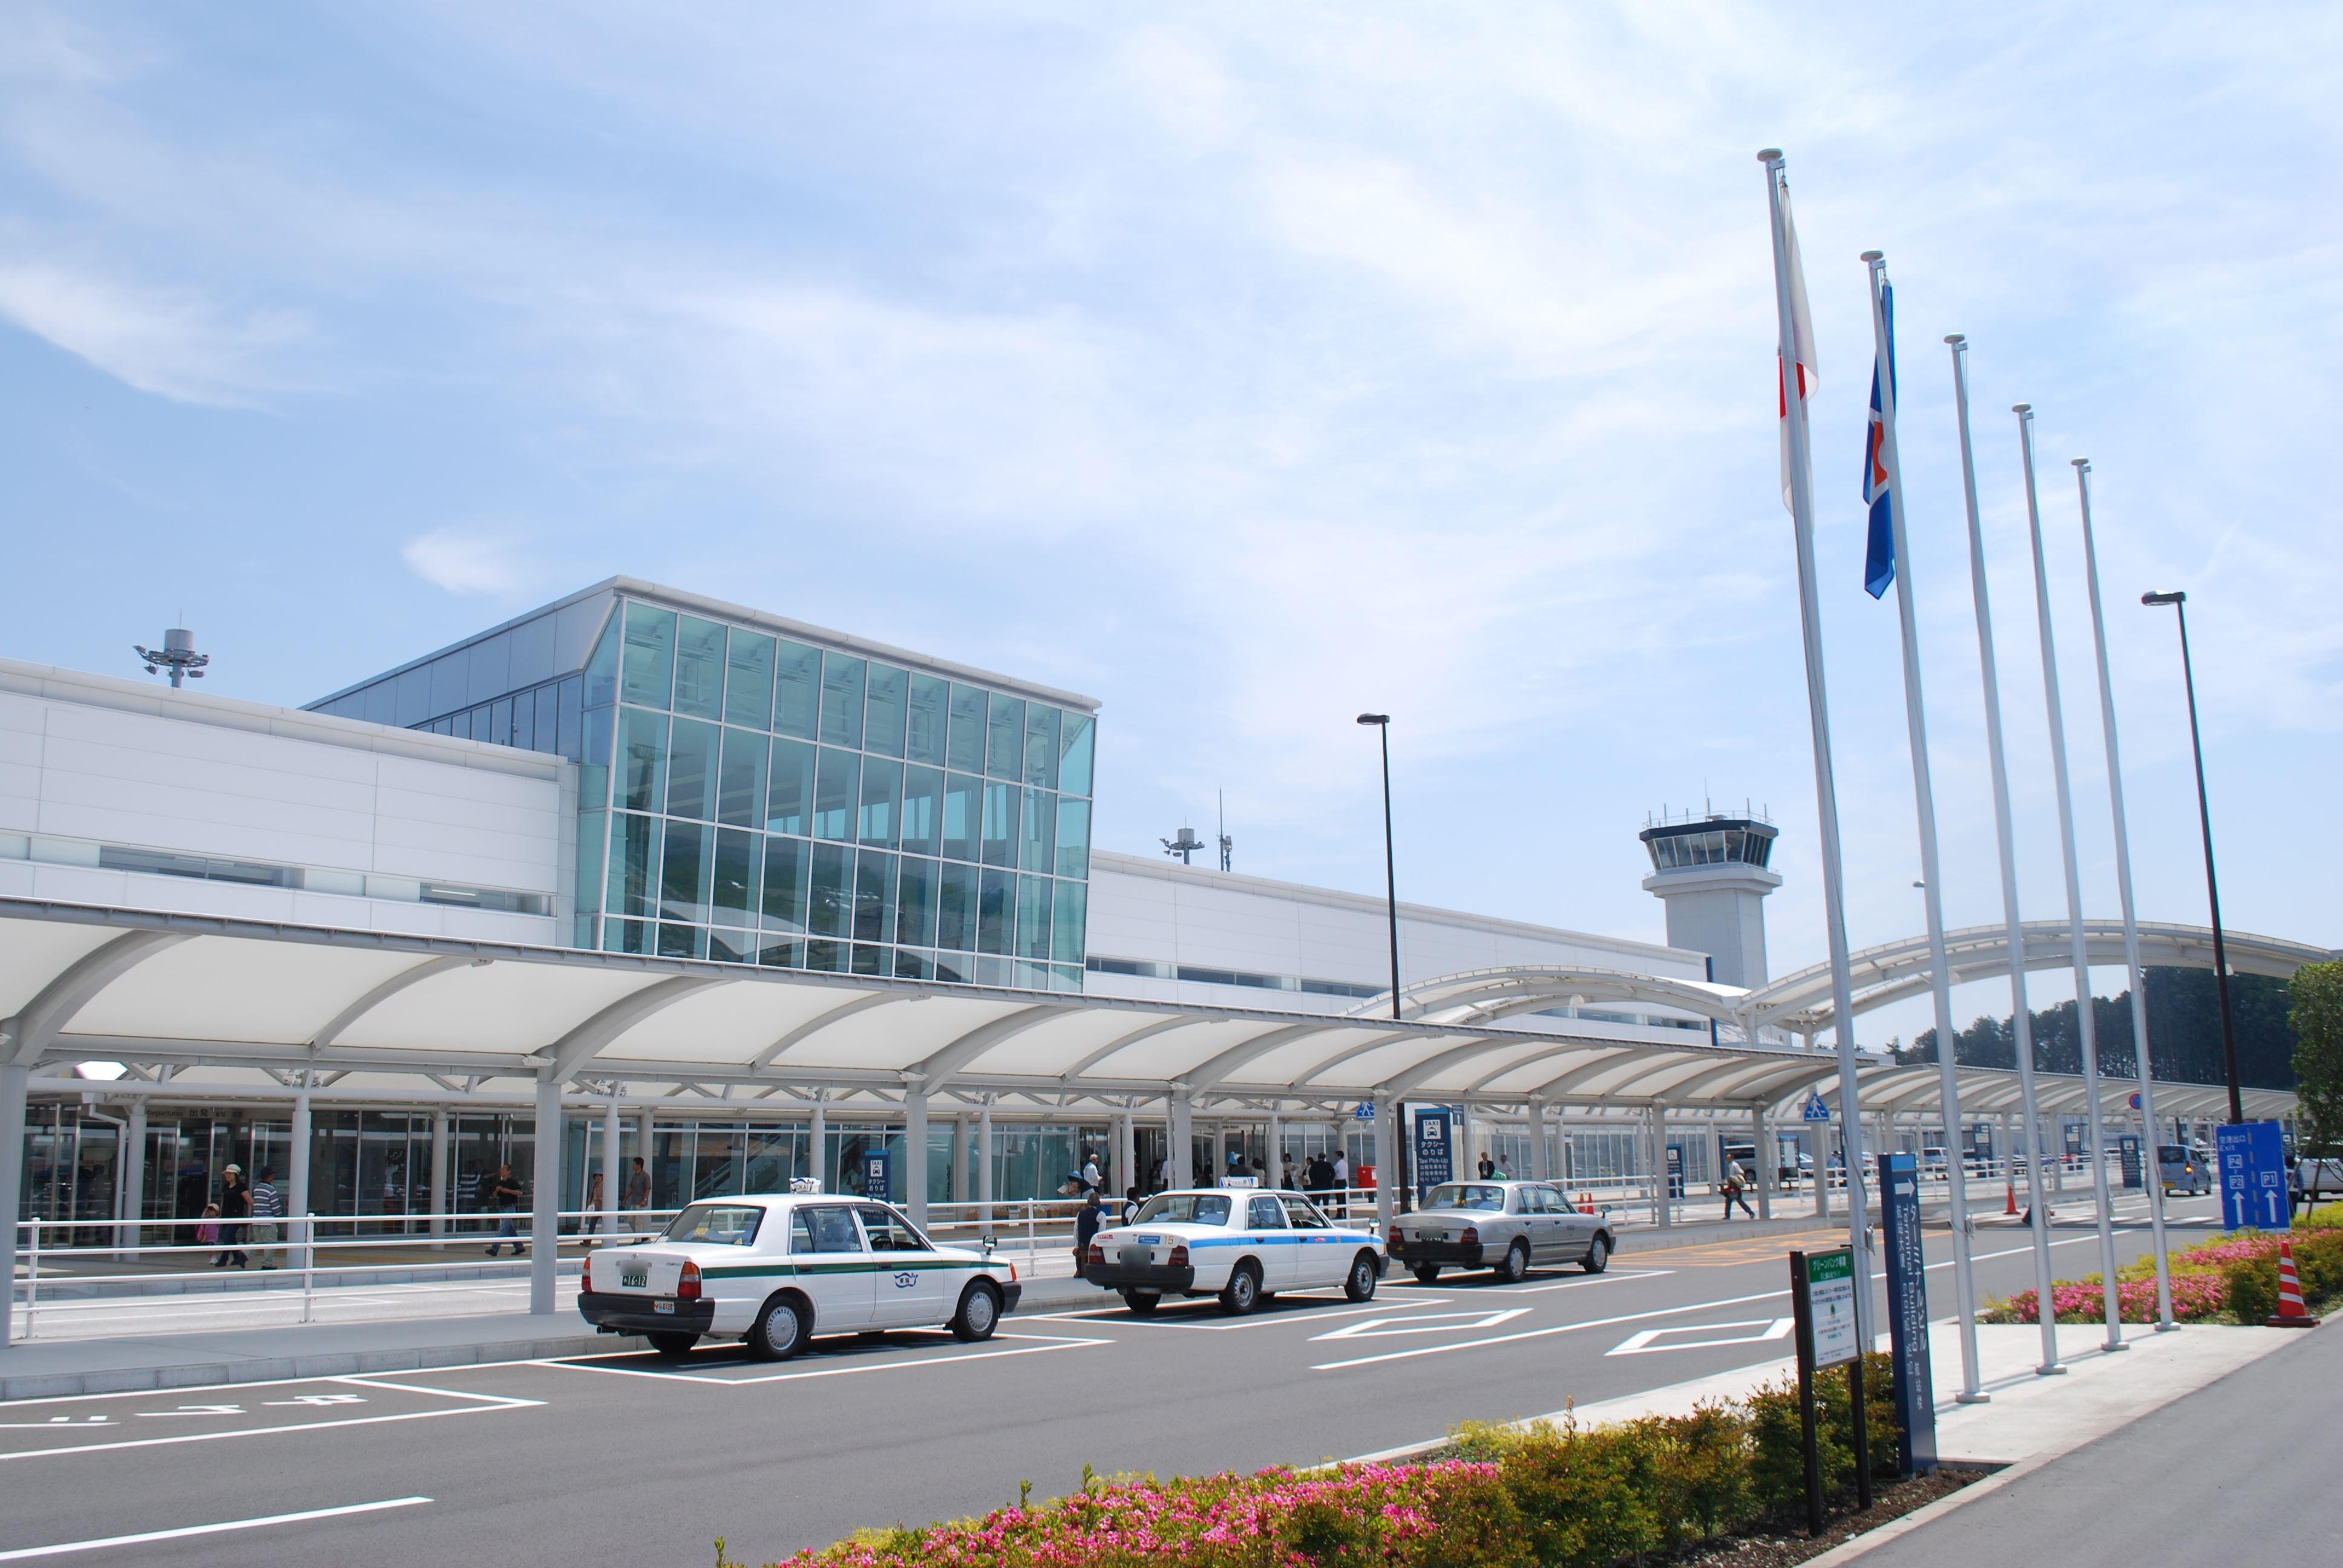 Shizuoka Japan  city images : Description Fujisan Shizuoka airport,Makinohara city,Japan